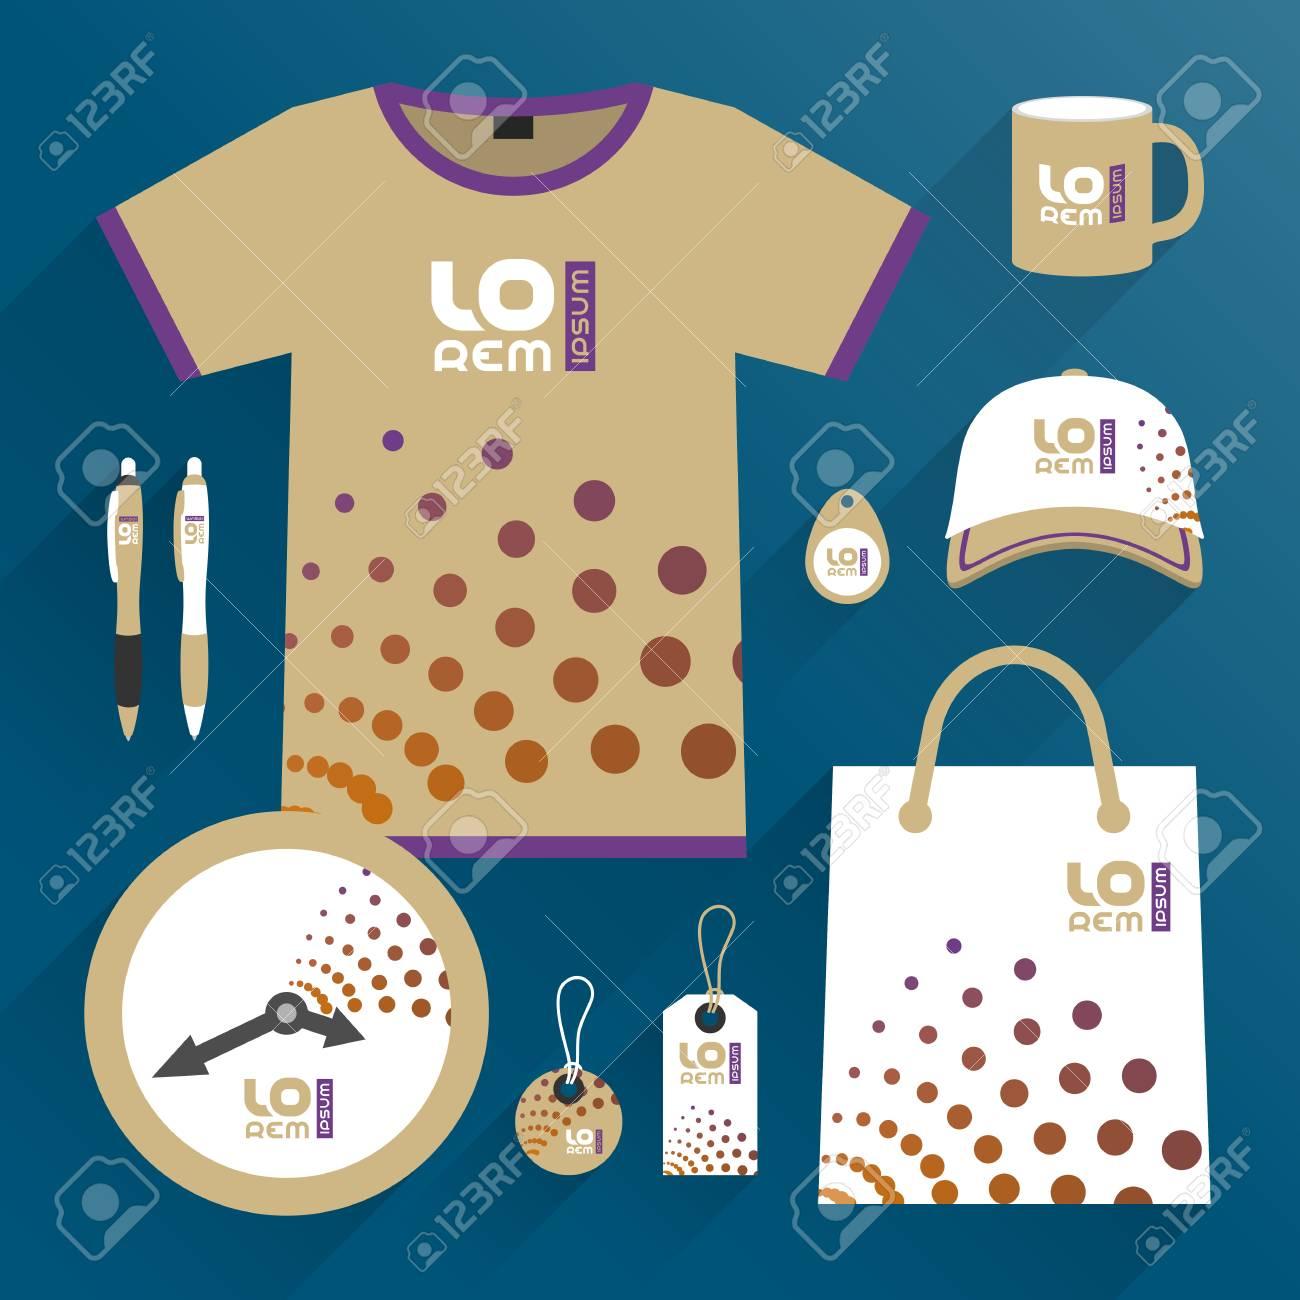 Modern Promotional Souvenirs Design Uniform For Corporate Identity